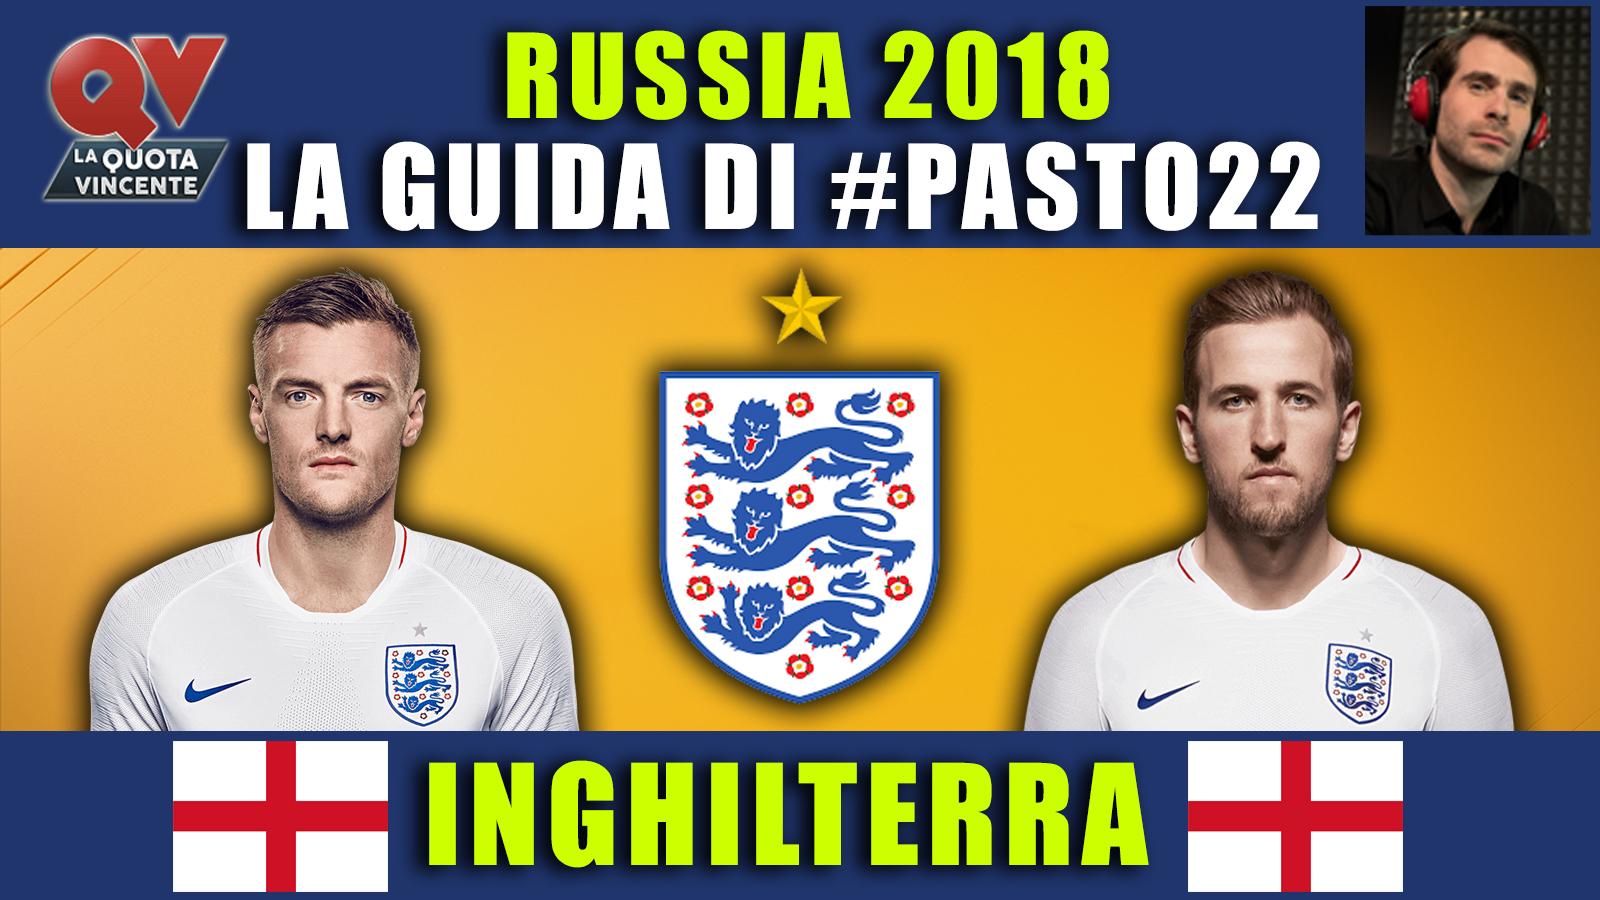 https://www.laquotavincente.it/guida-mondiali-russia-2018-inghilterra/